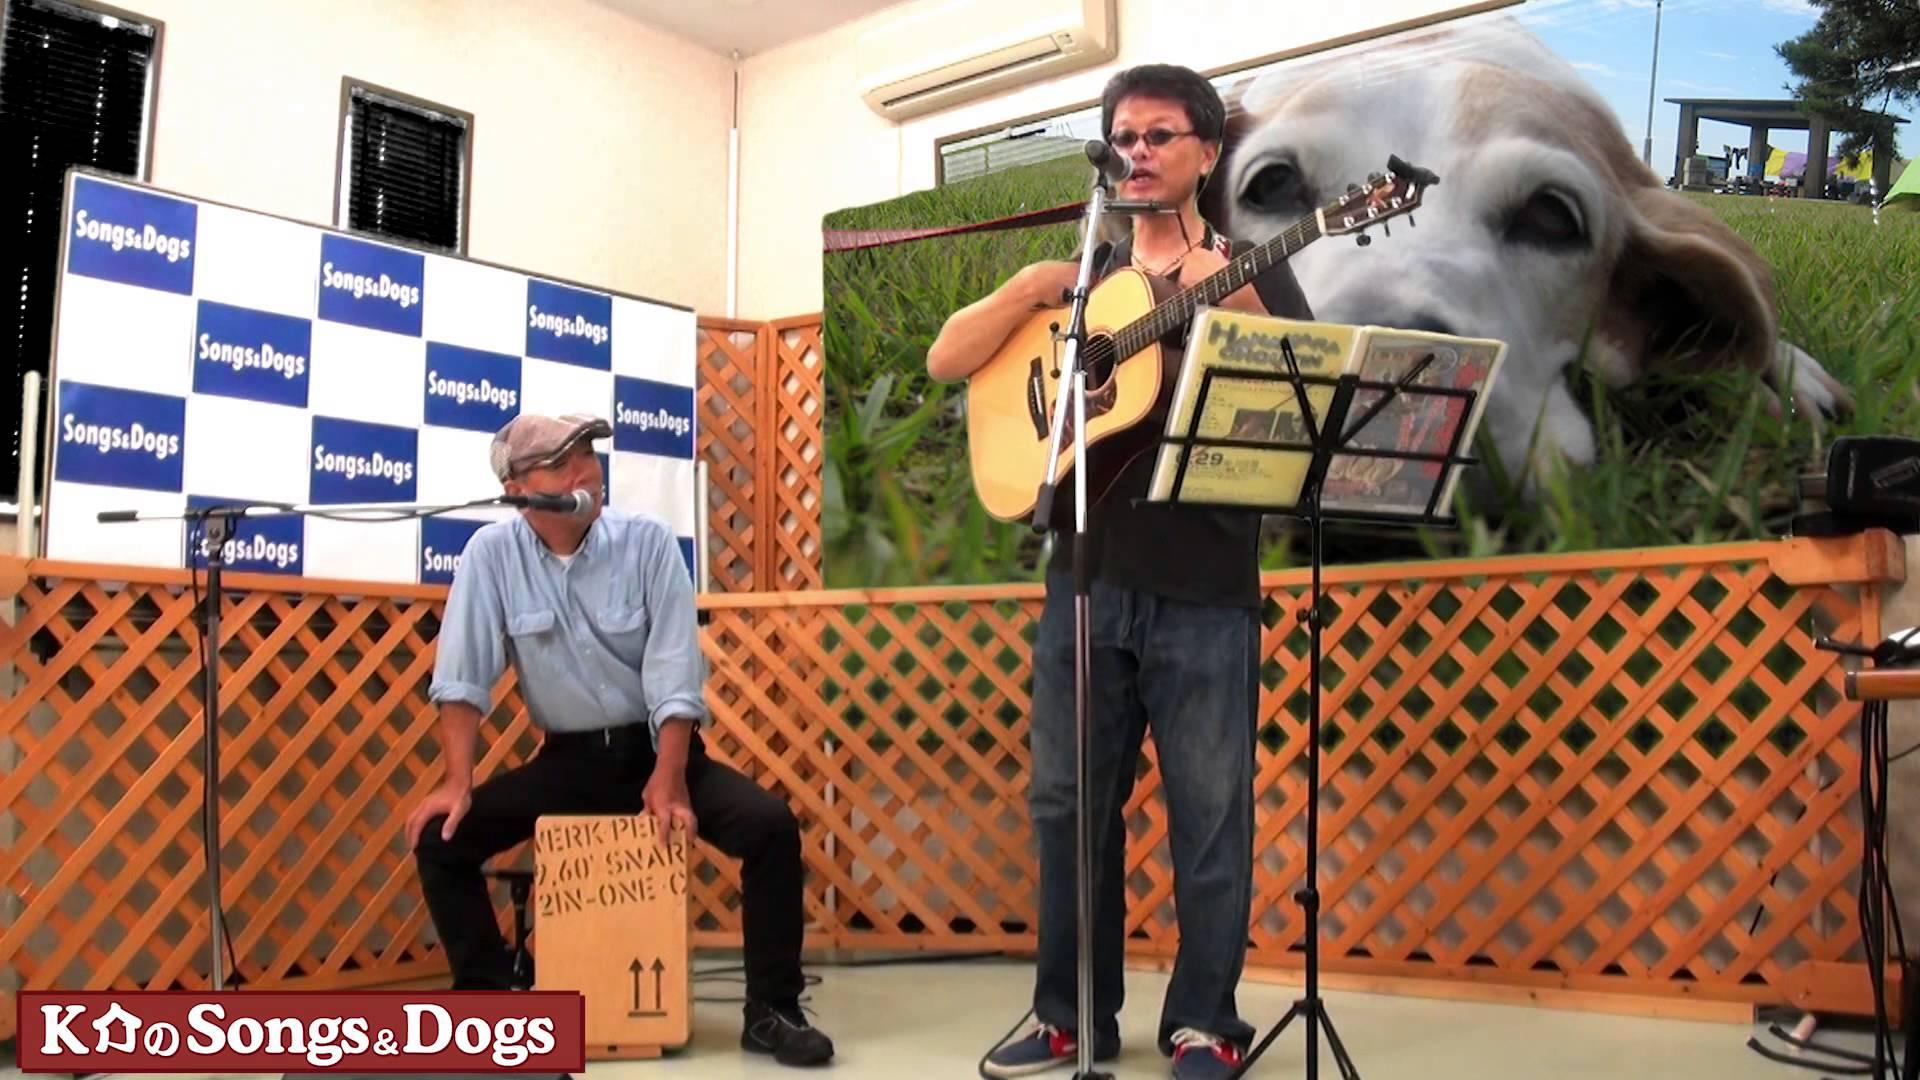 K介のSongs&Dogs週末はミュージシャン83